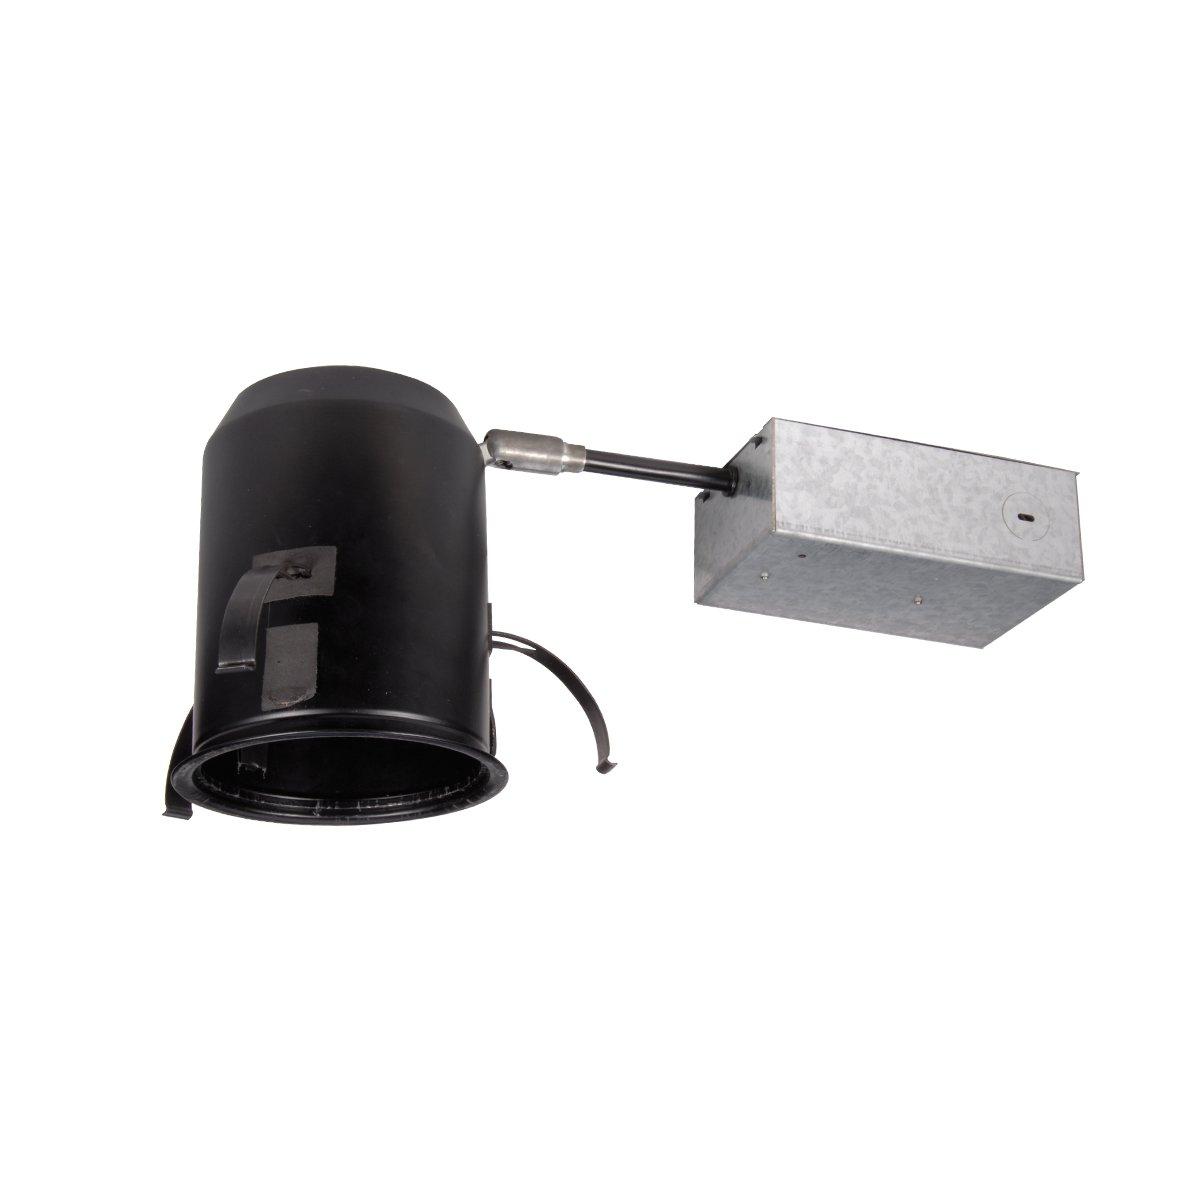 WAC Lighting HR-3LED-R18D-A LED 3-Inch  20-watt Recessed Down Light Remodel Housing